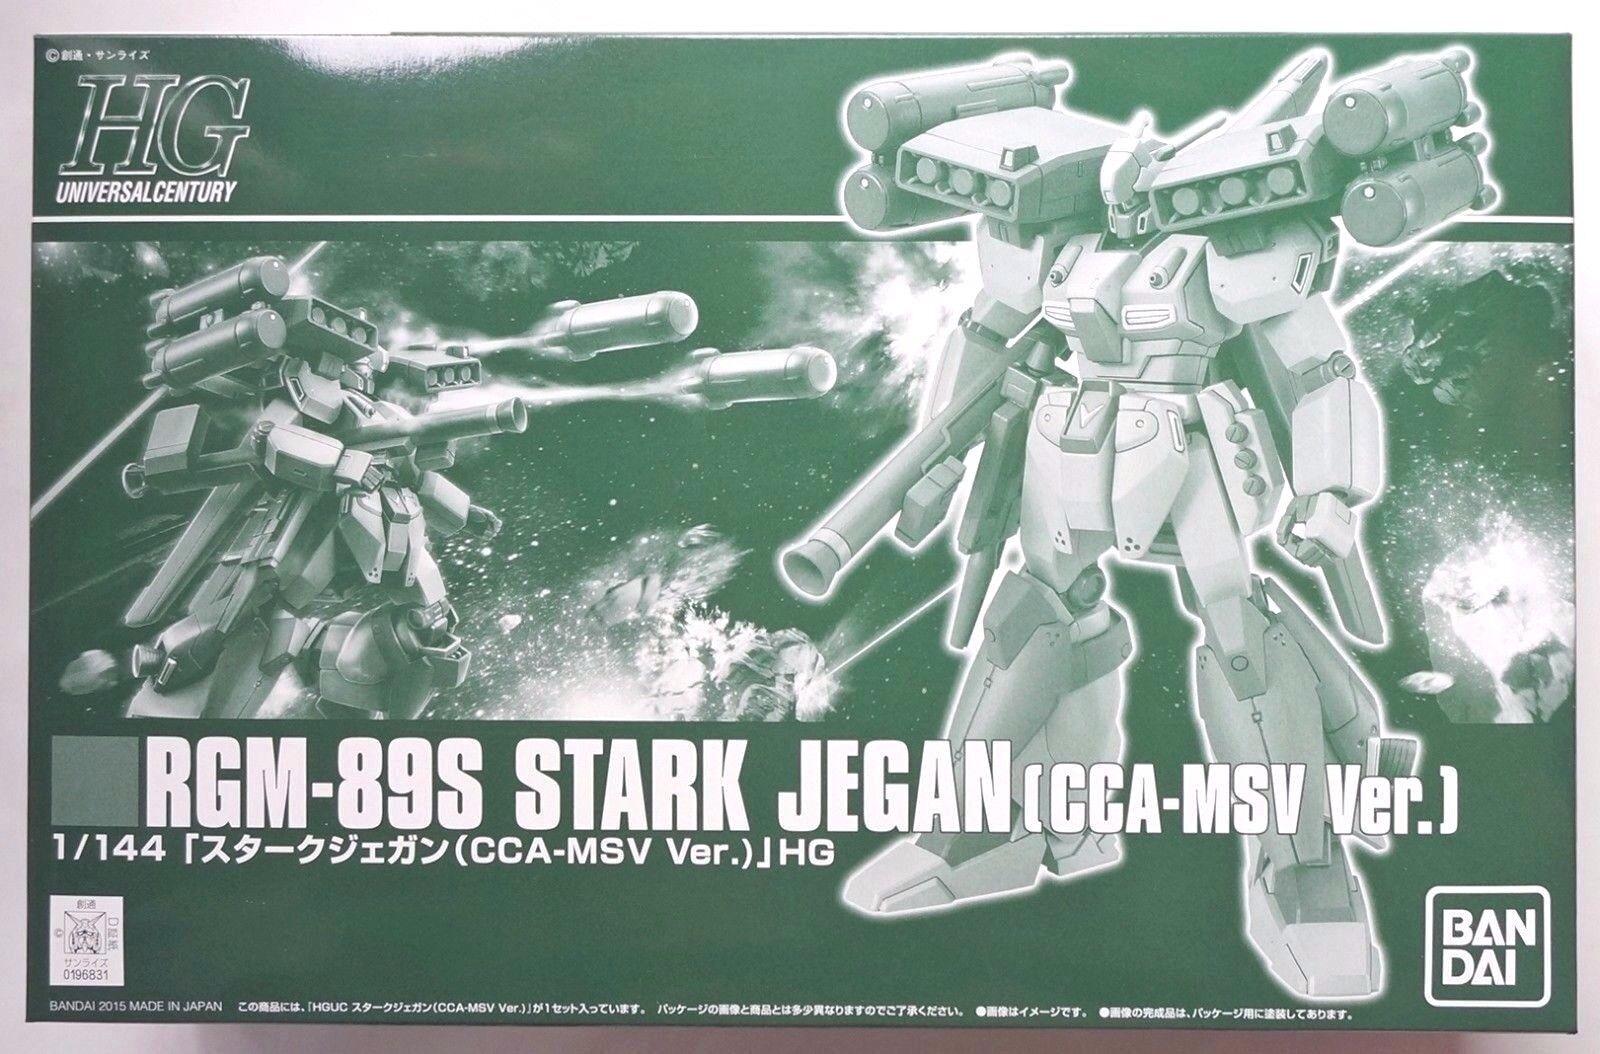 BANDAI HGUC 1 144 RGM-89S Stark Jegan CCA-MSV Premium Bandai Bandai Bandai limited model kit dff3db